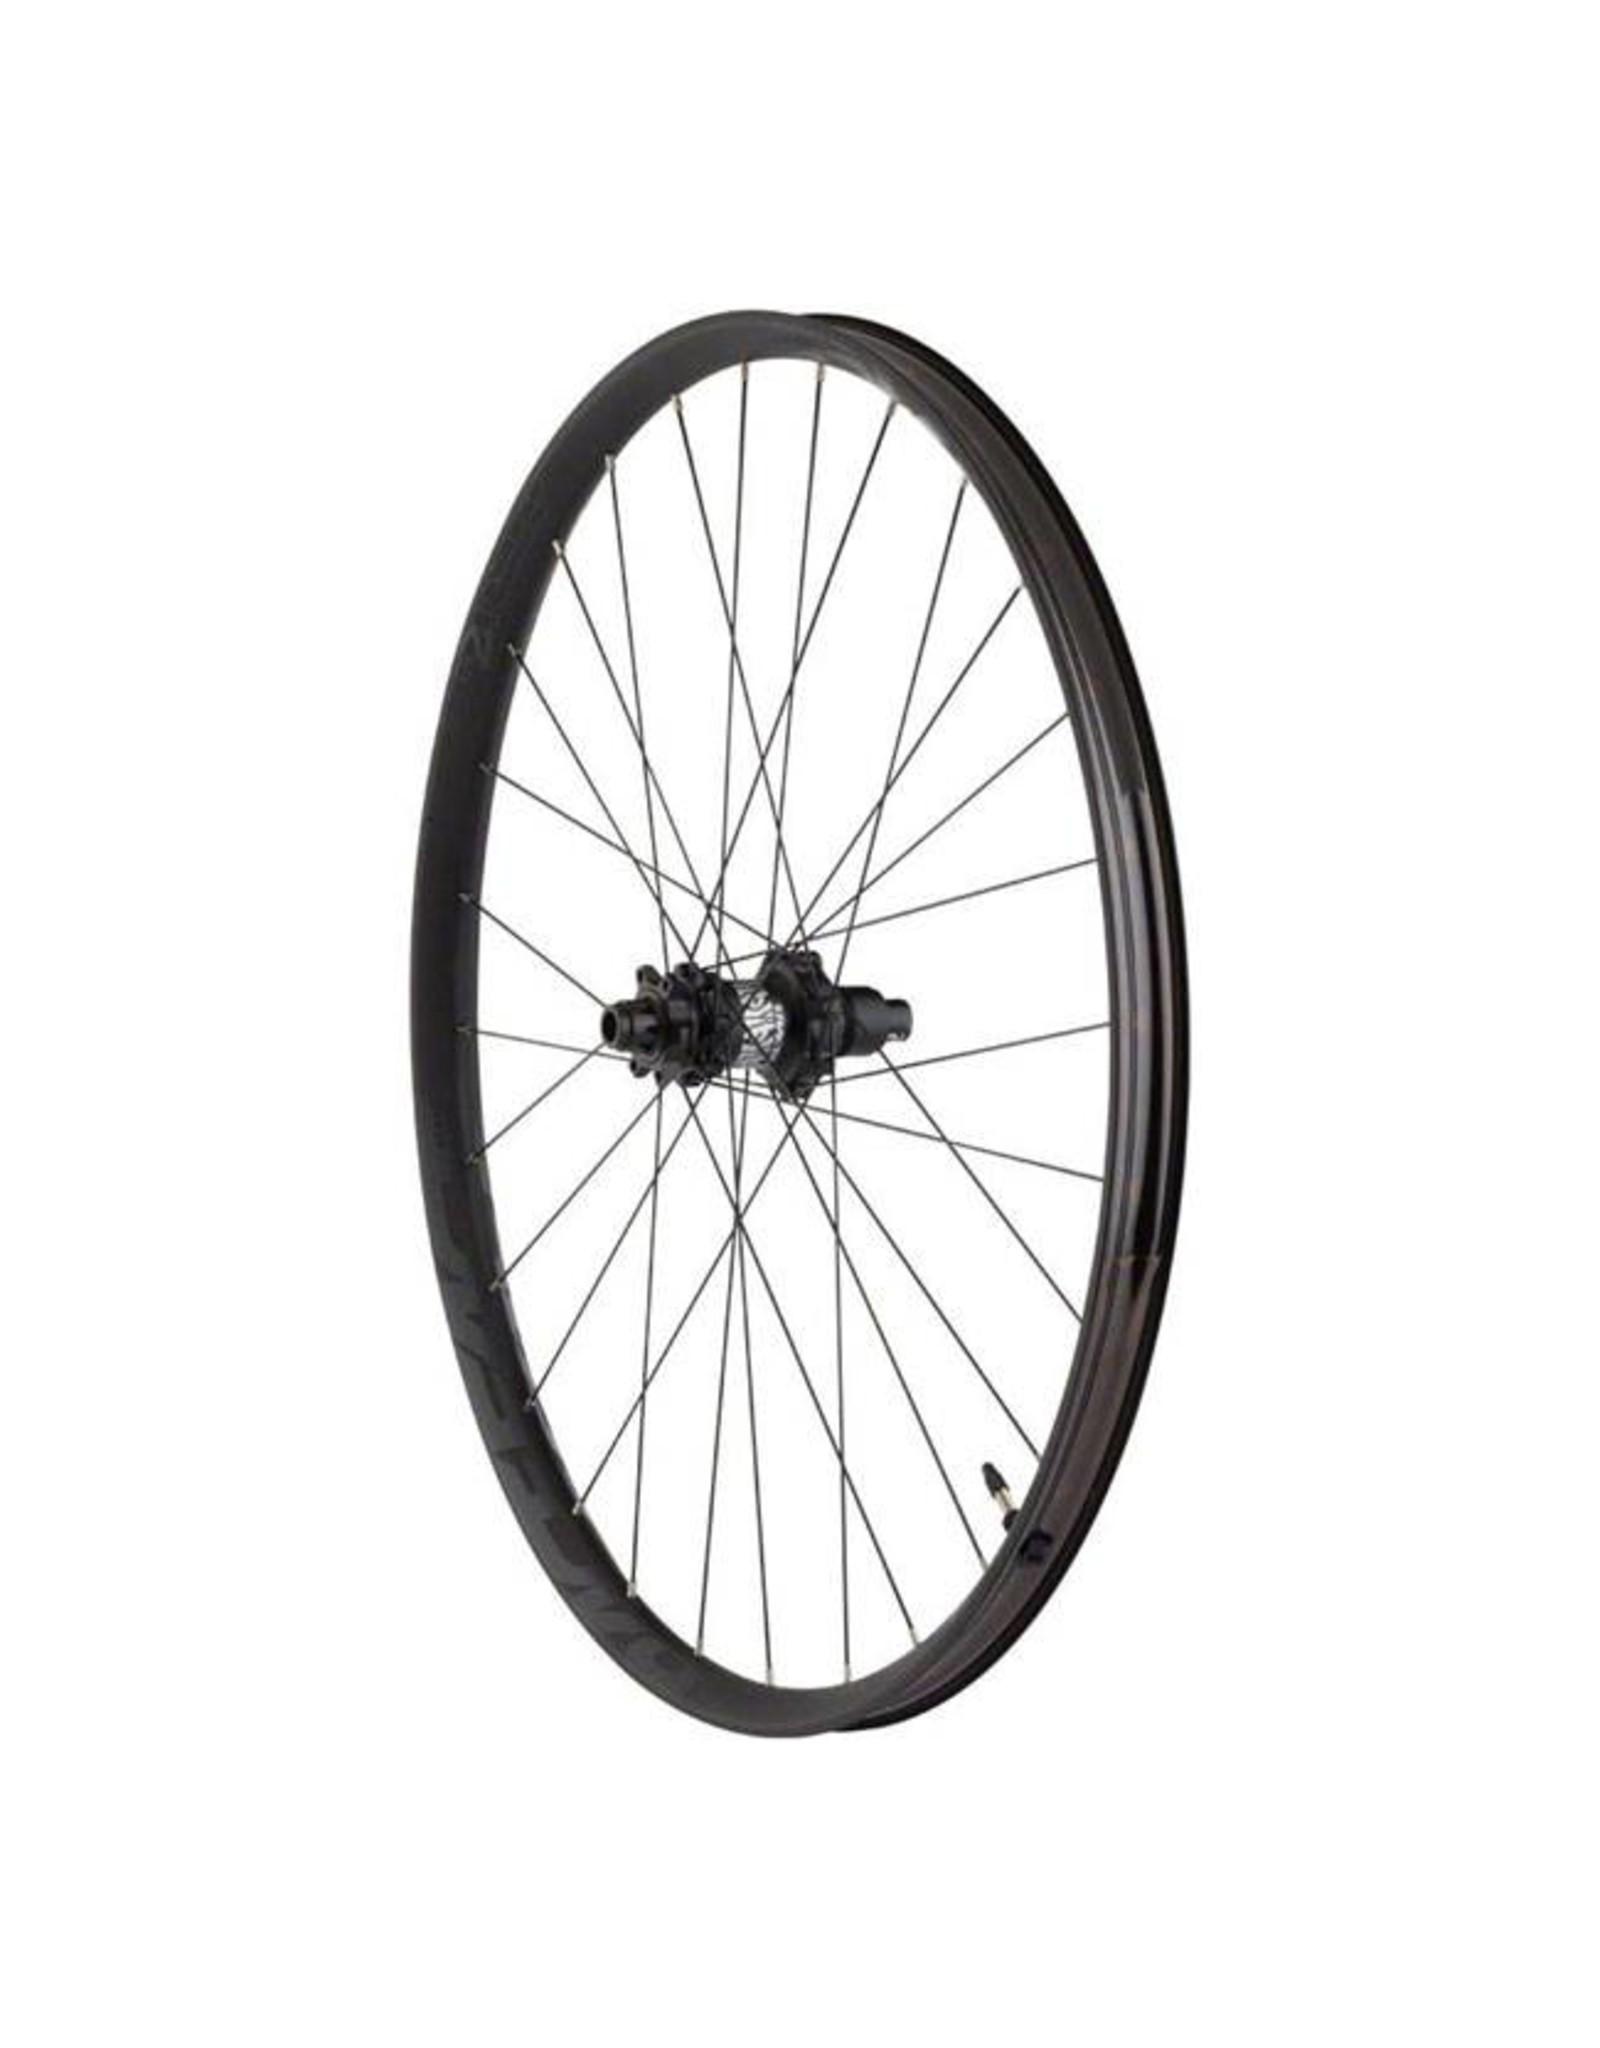 "RaceFace RaceFace Aeffect R Rear Wheel: 29"", Alloy Rim, 12 x 148mm Thru Axle, Shimano Freehub"